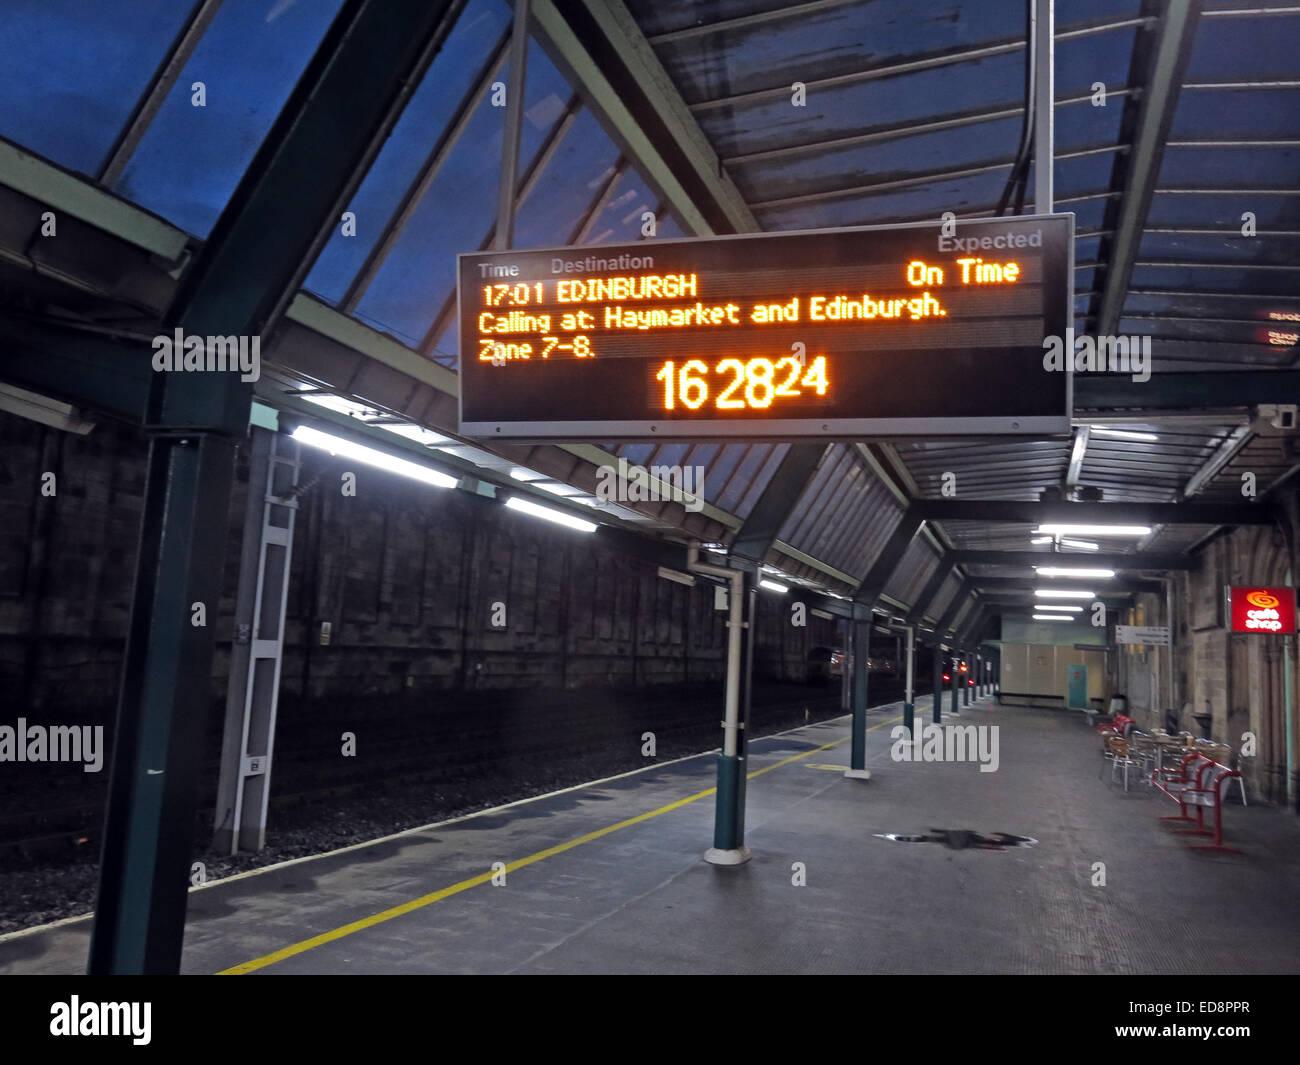 VT WCML West Coast Main Line Mainline dusk,next,Virgin,train,to,Edinburgh,night,nighttime,train,calling,at,Haymarket,railroad,track,railtrack,BR,British,Rail,BritishRail,GoTonySmith